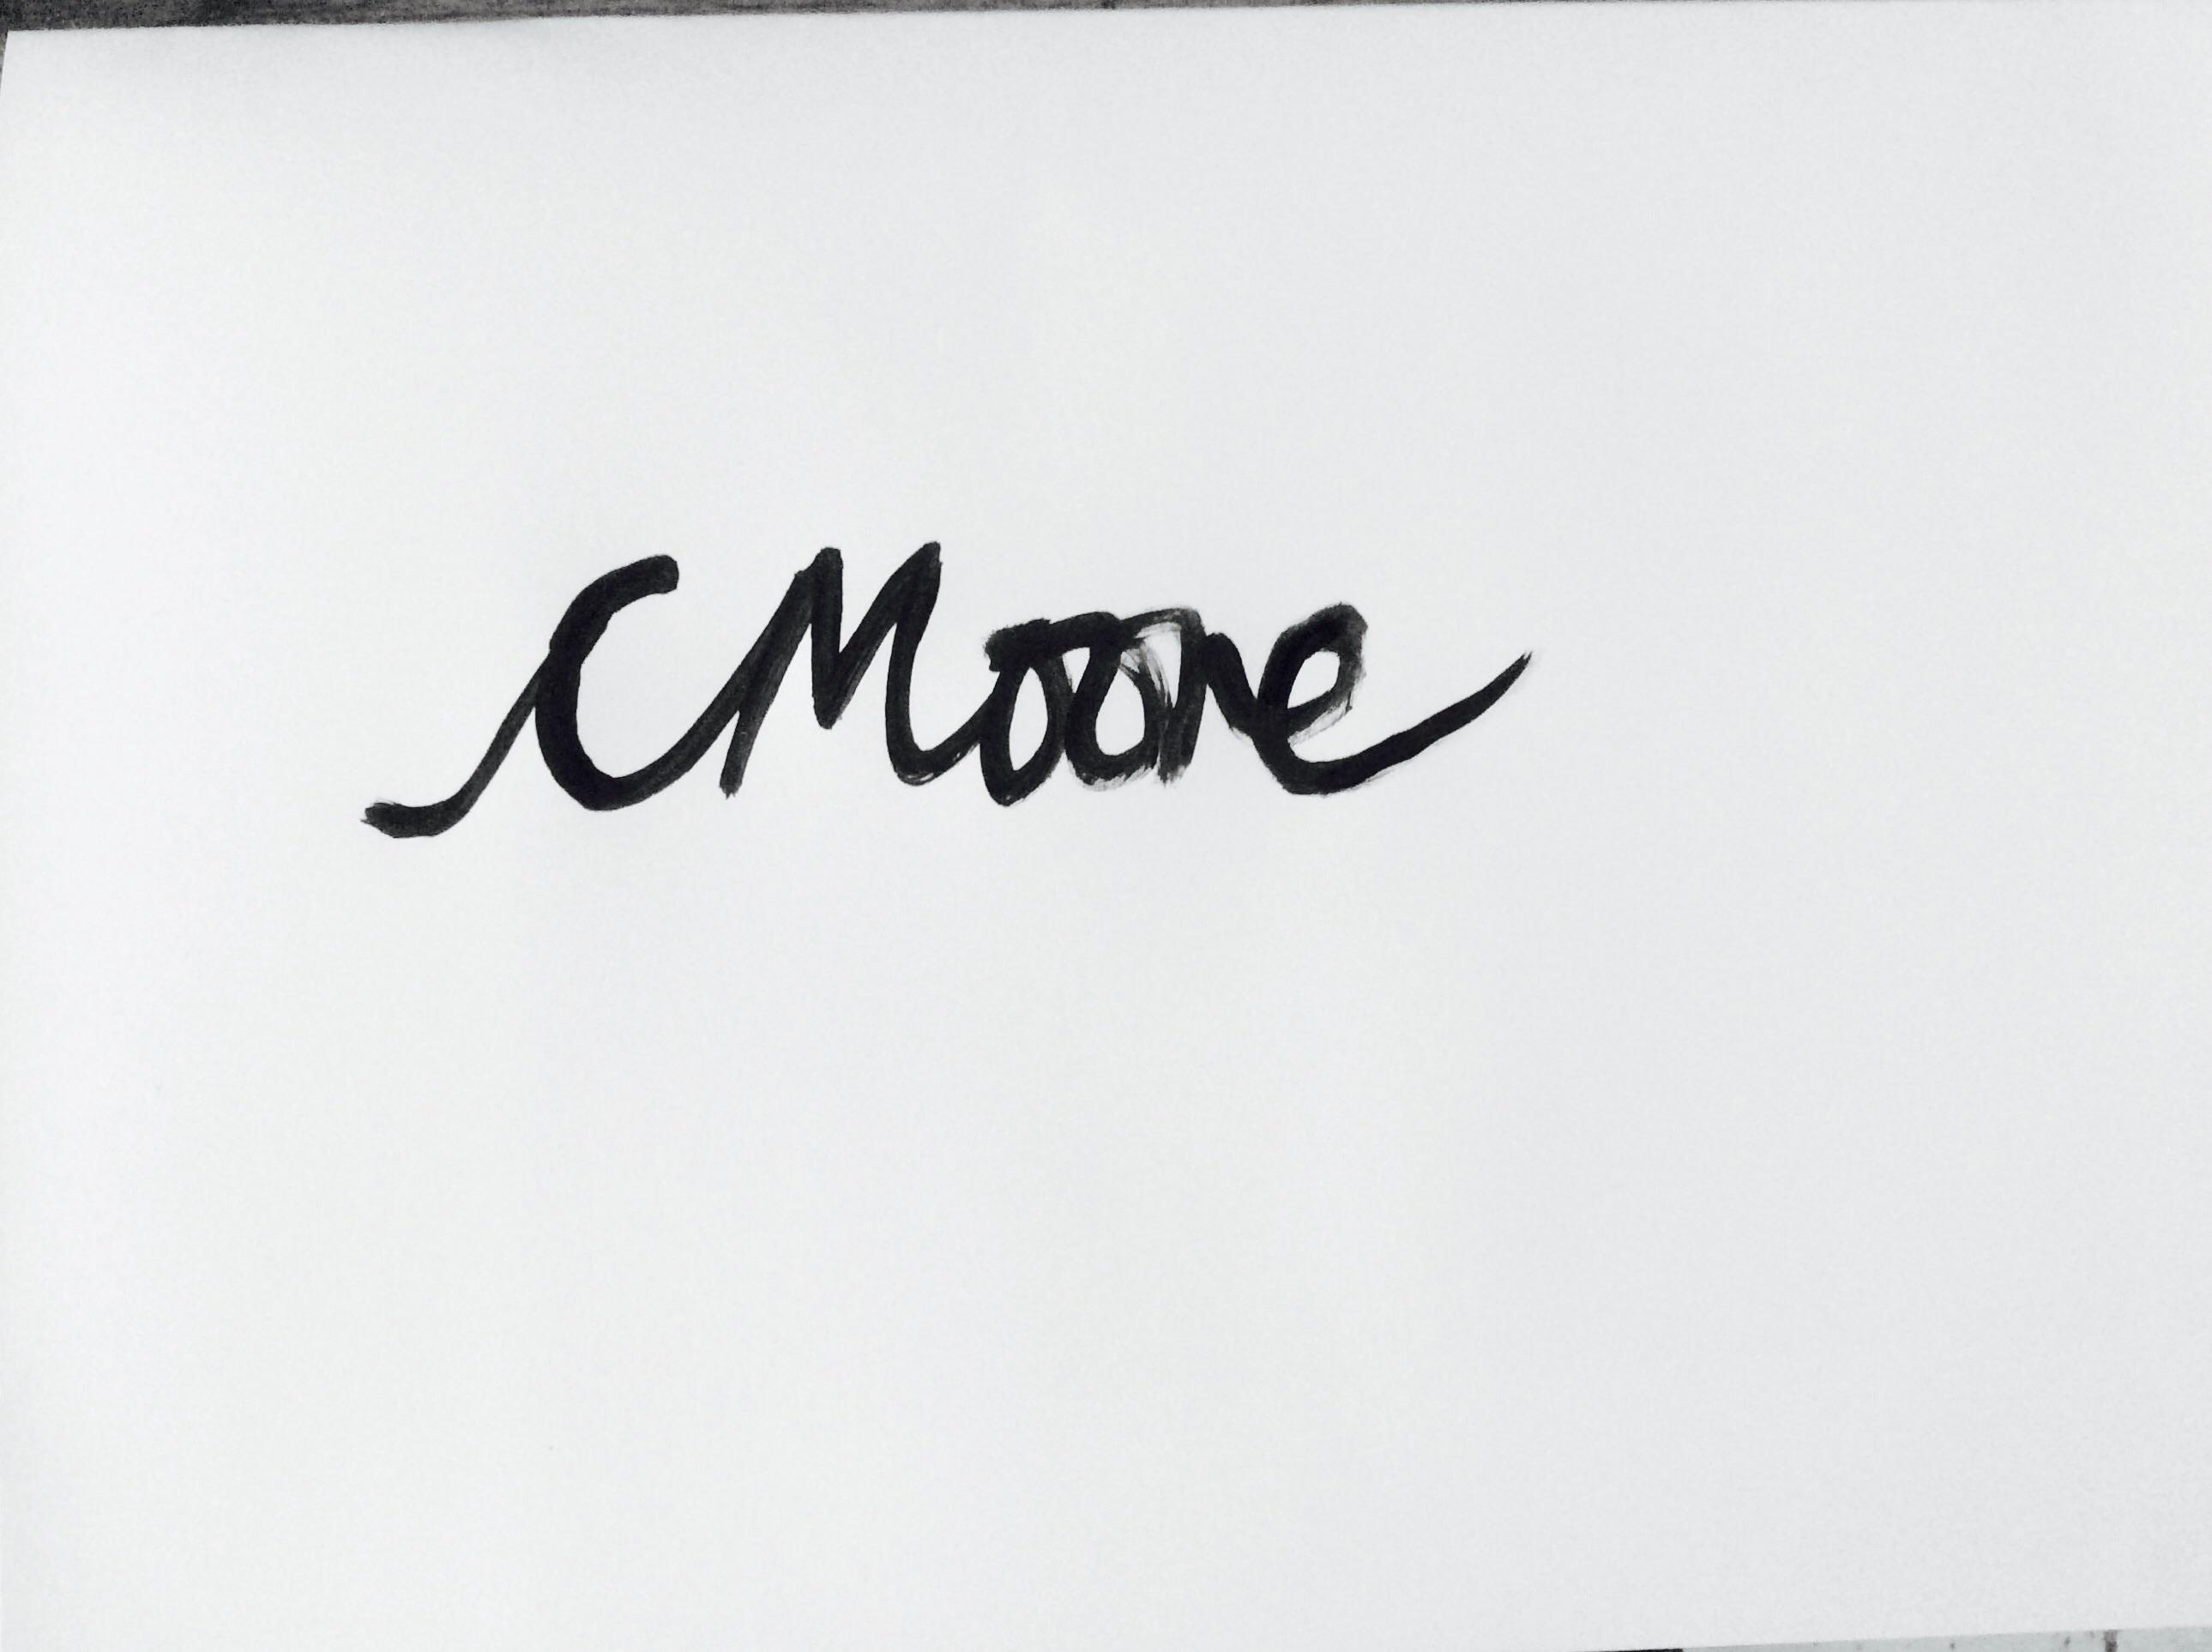 Charlotte Moore Signature